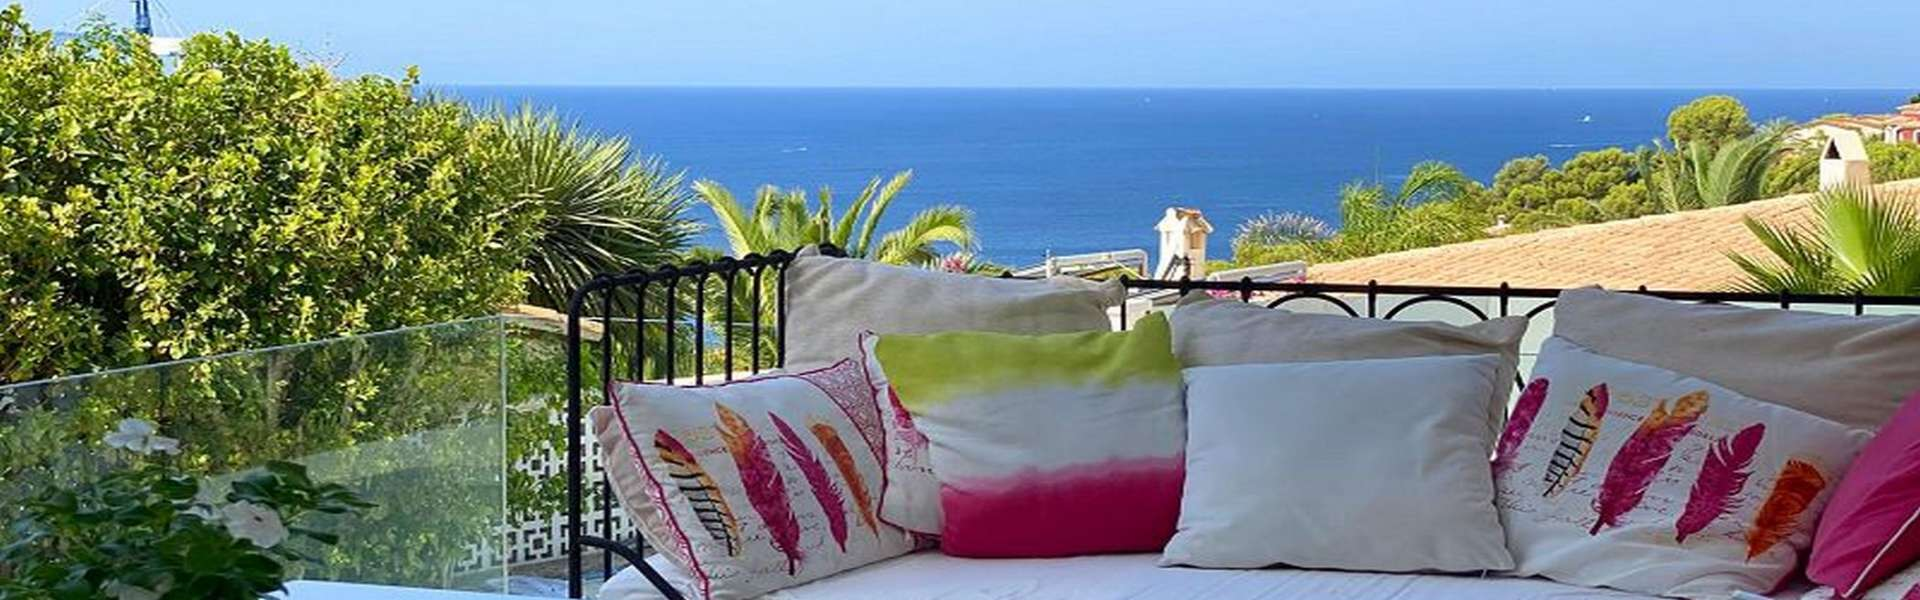 Costa de la Calma - Moderne Villa mit Meerblick zum Verkauf